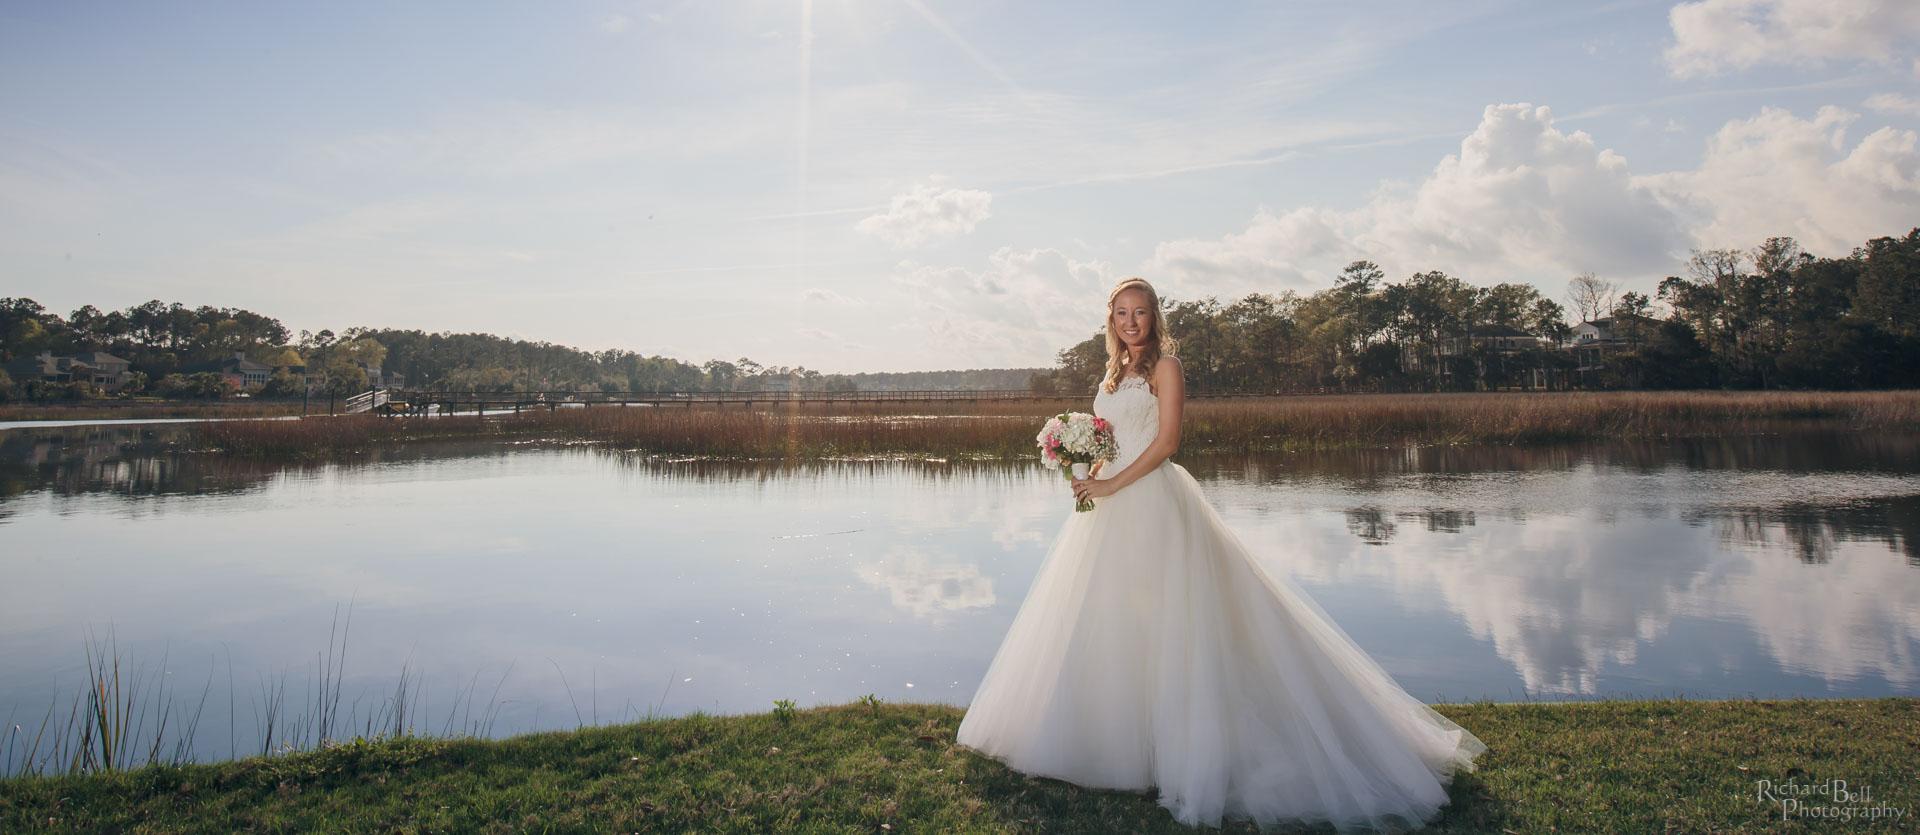 Bride at Dunes West